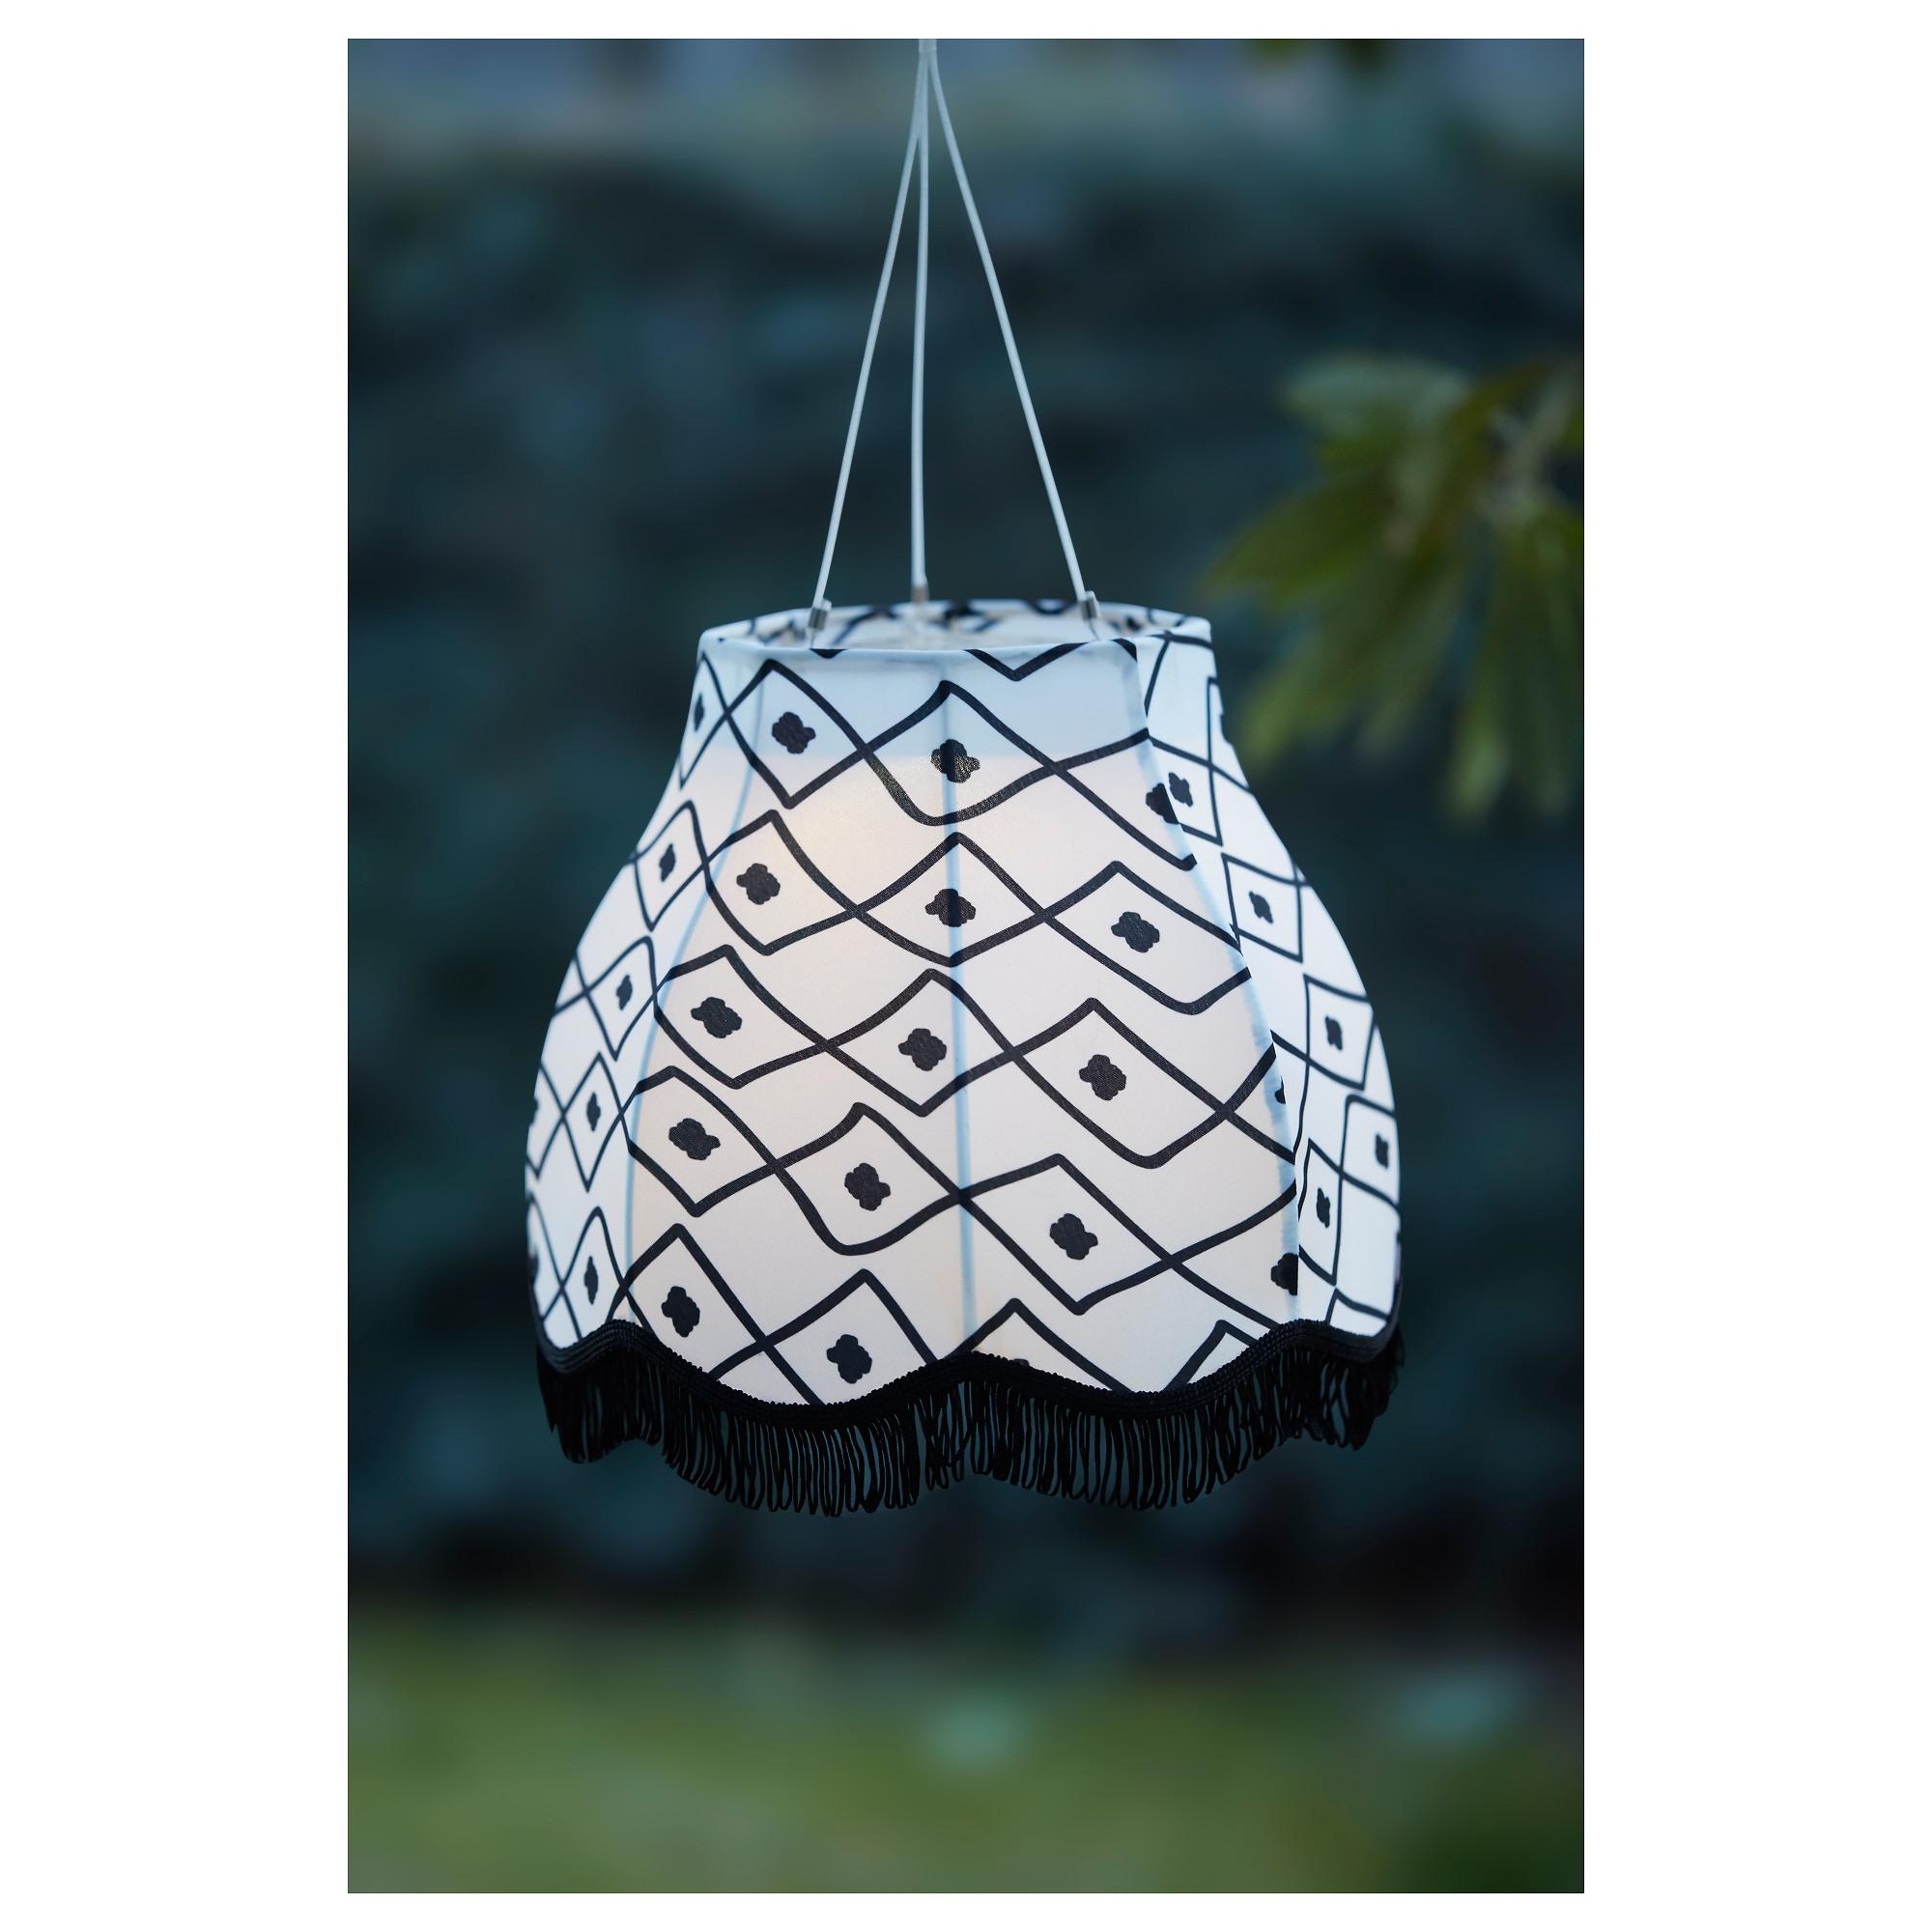 Подвесная светодиодная лампа СОЛВИДЕН артикуль № 403.405.78 в наличии. Онлайн магазин IKEA РБ. Быстрая доставка и установка.